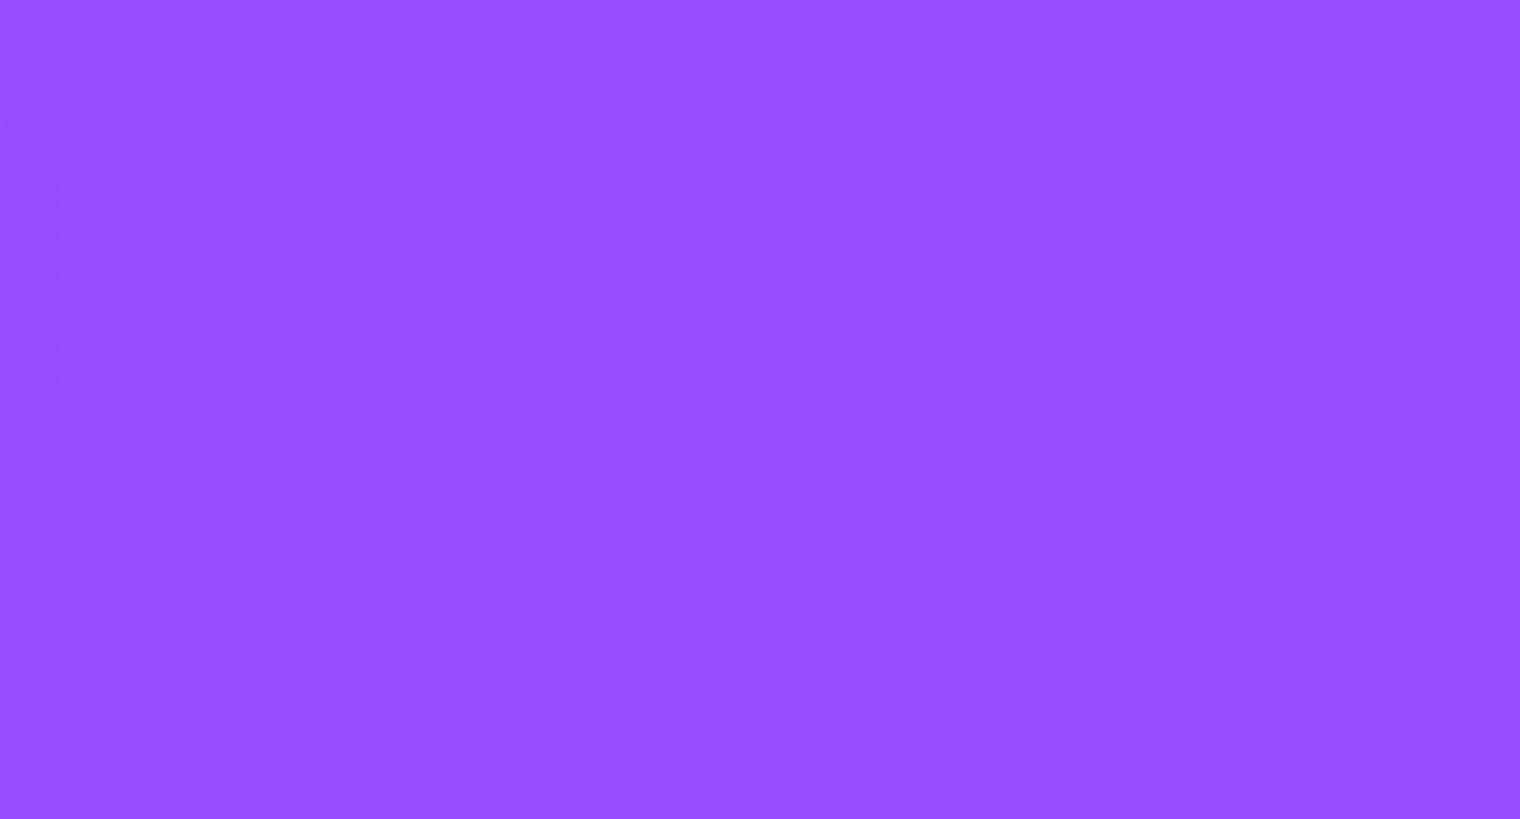 Light Purple Color Wallpapers - Wallpaper Cave